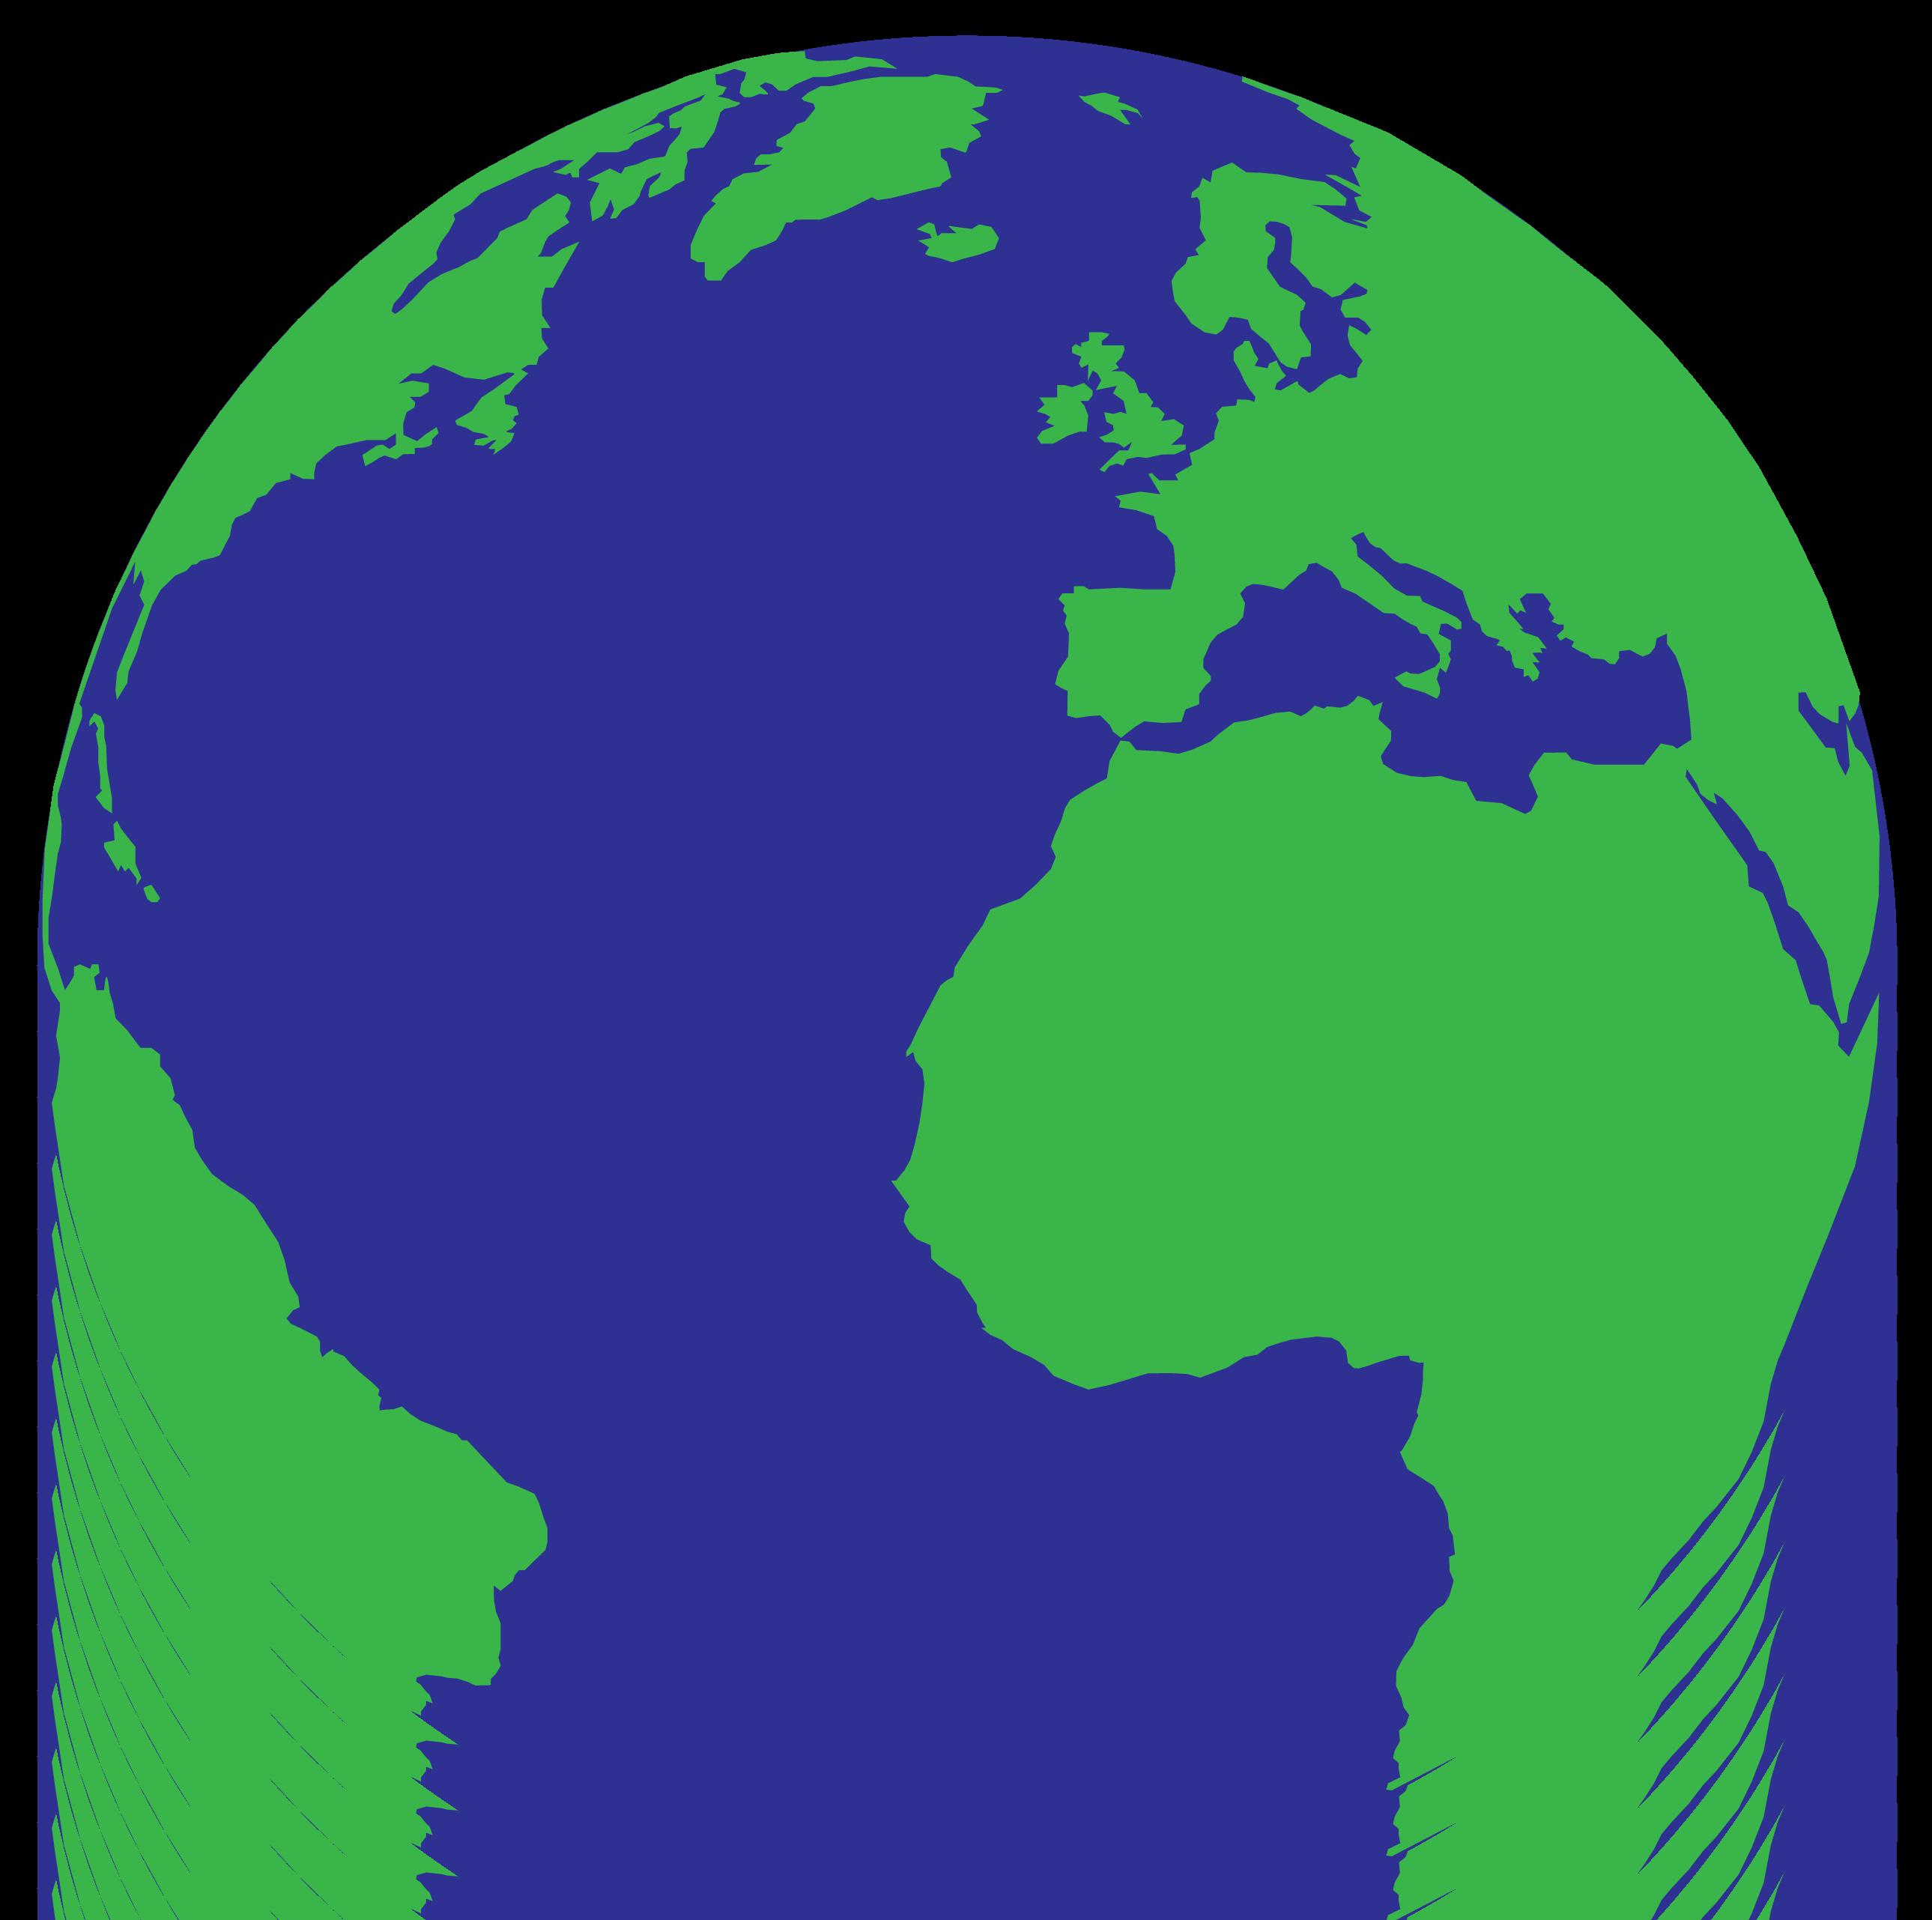 Clip Art Planet Earth Clipart simple planet earth clipart kid vector by deebeeart on deviantart